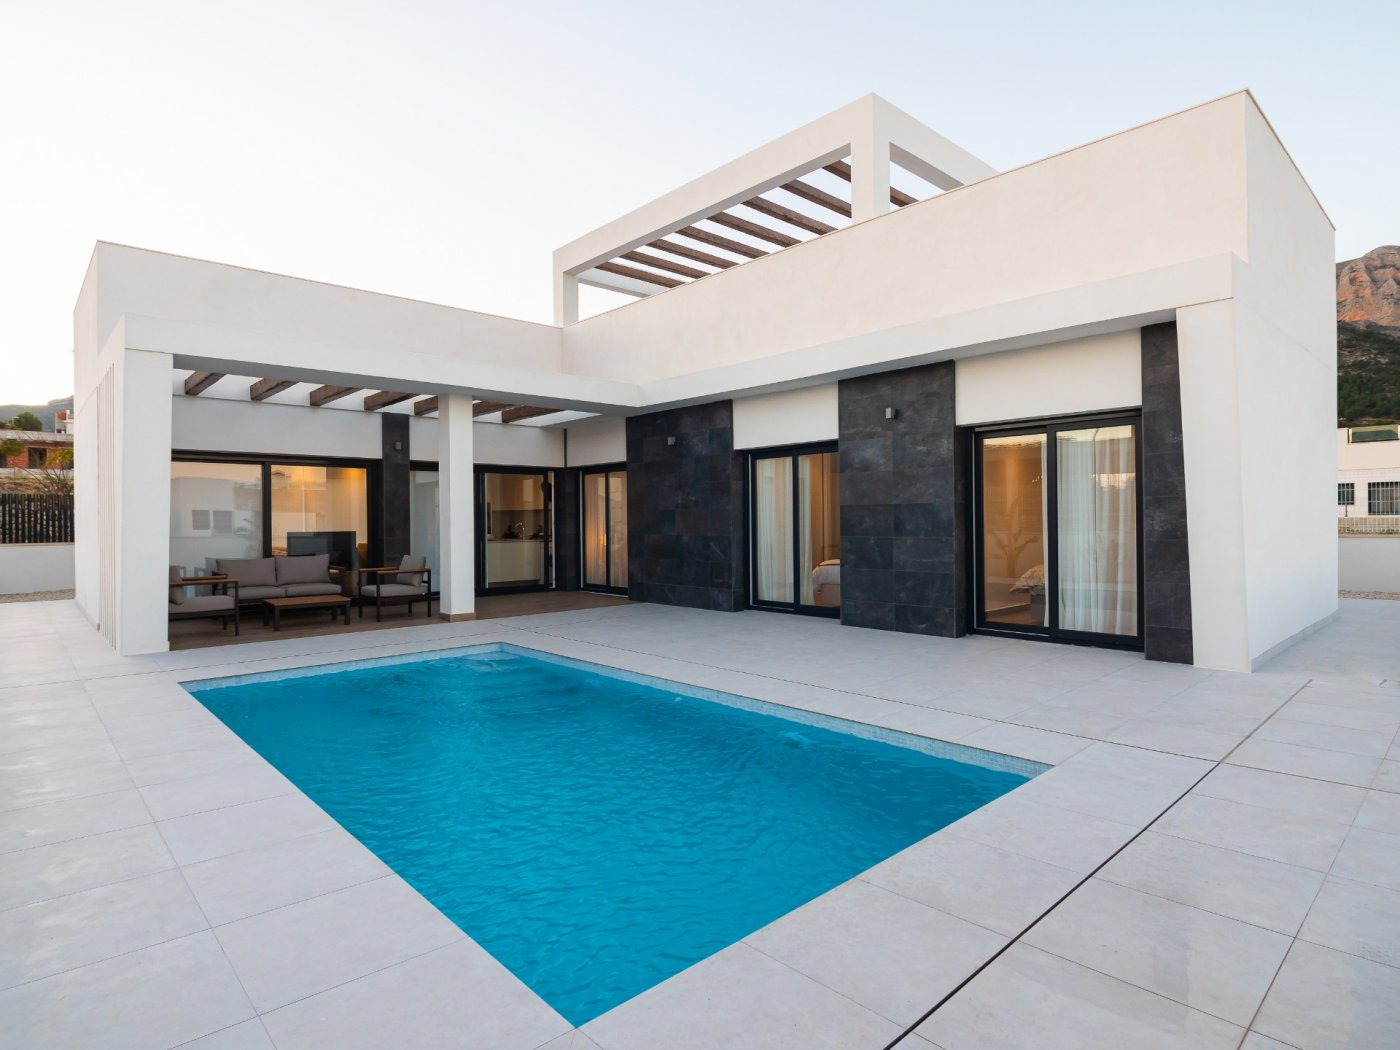 Real Estate Agents Altea - Properties for sale in Altea - villa - urbanizaciones